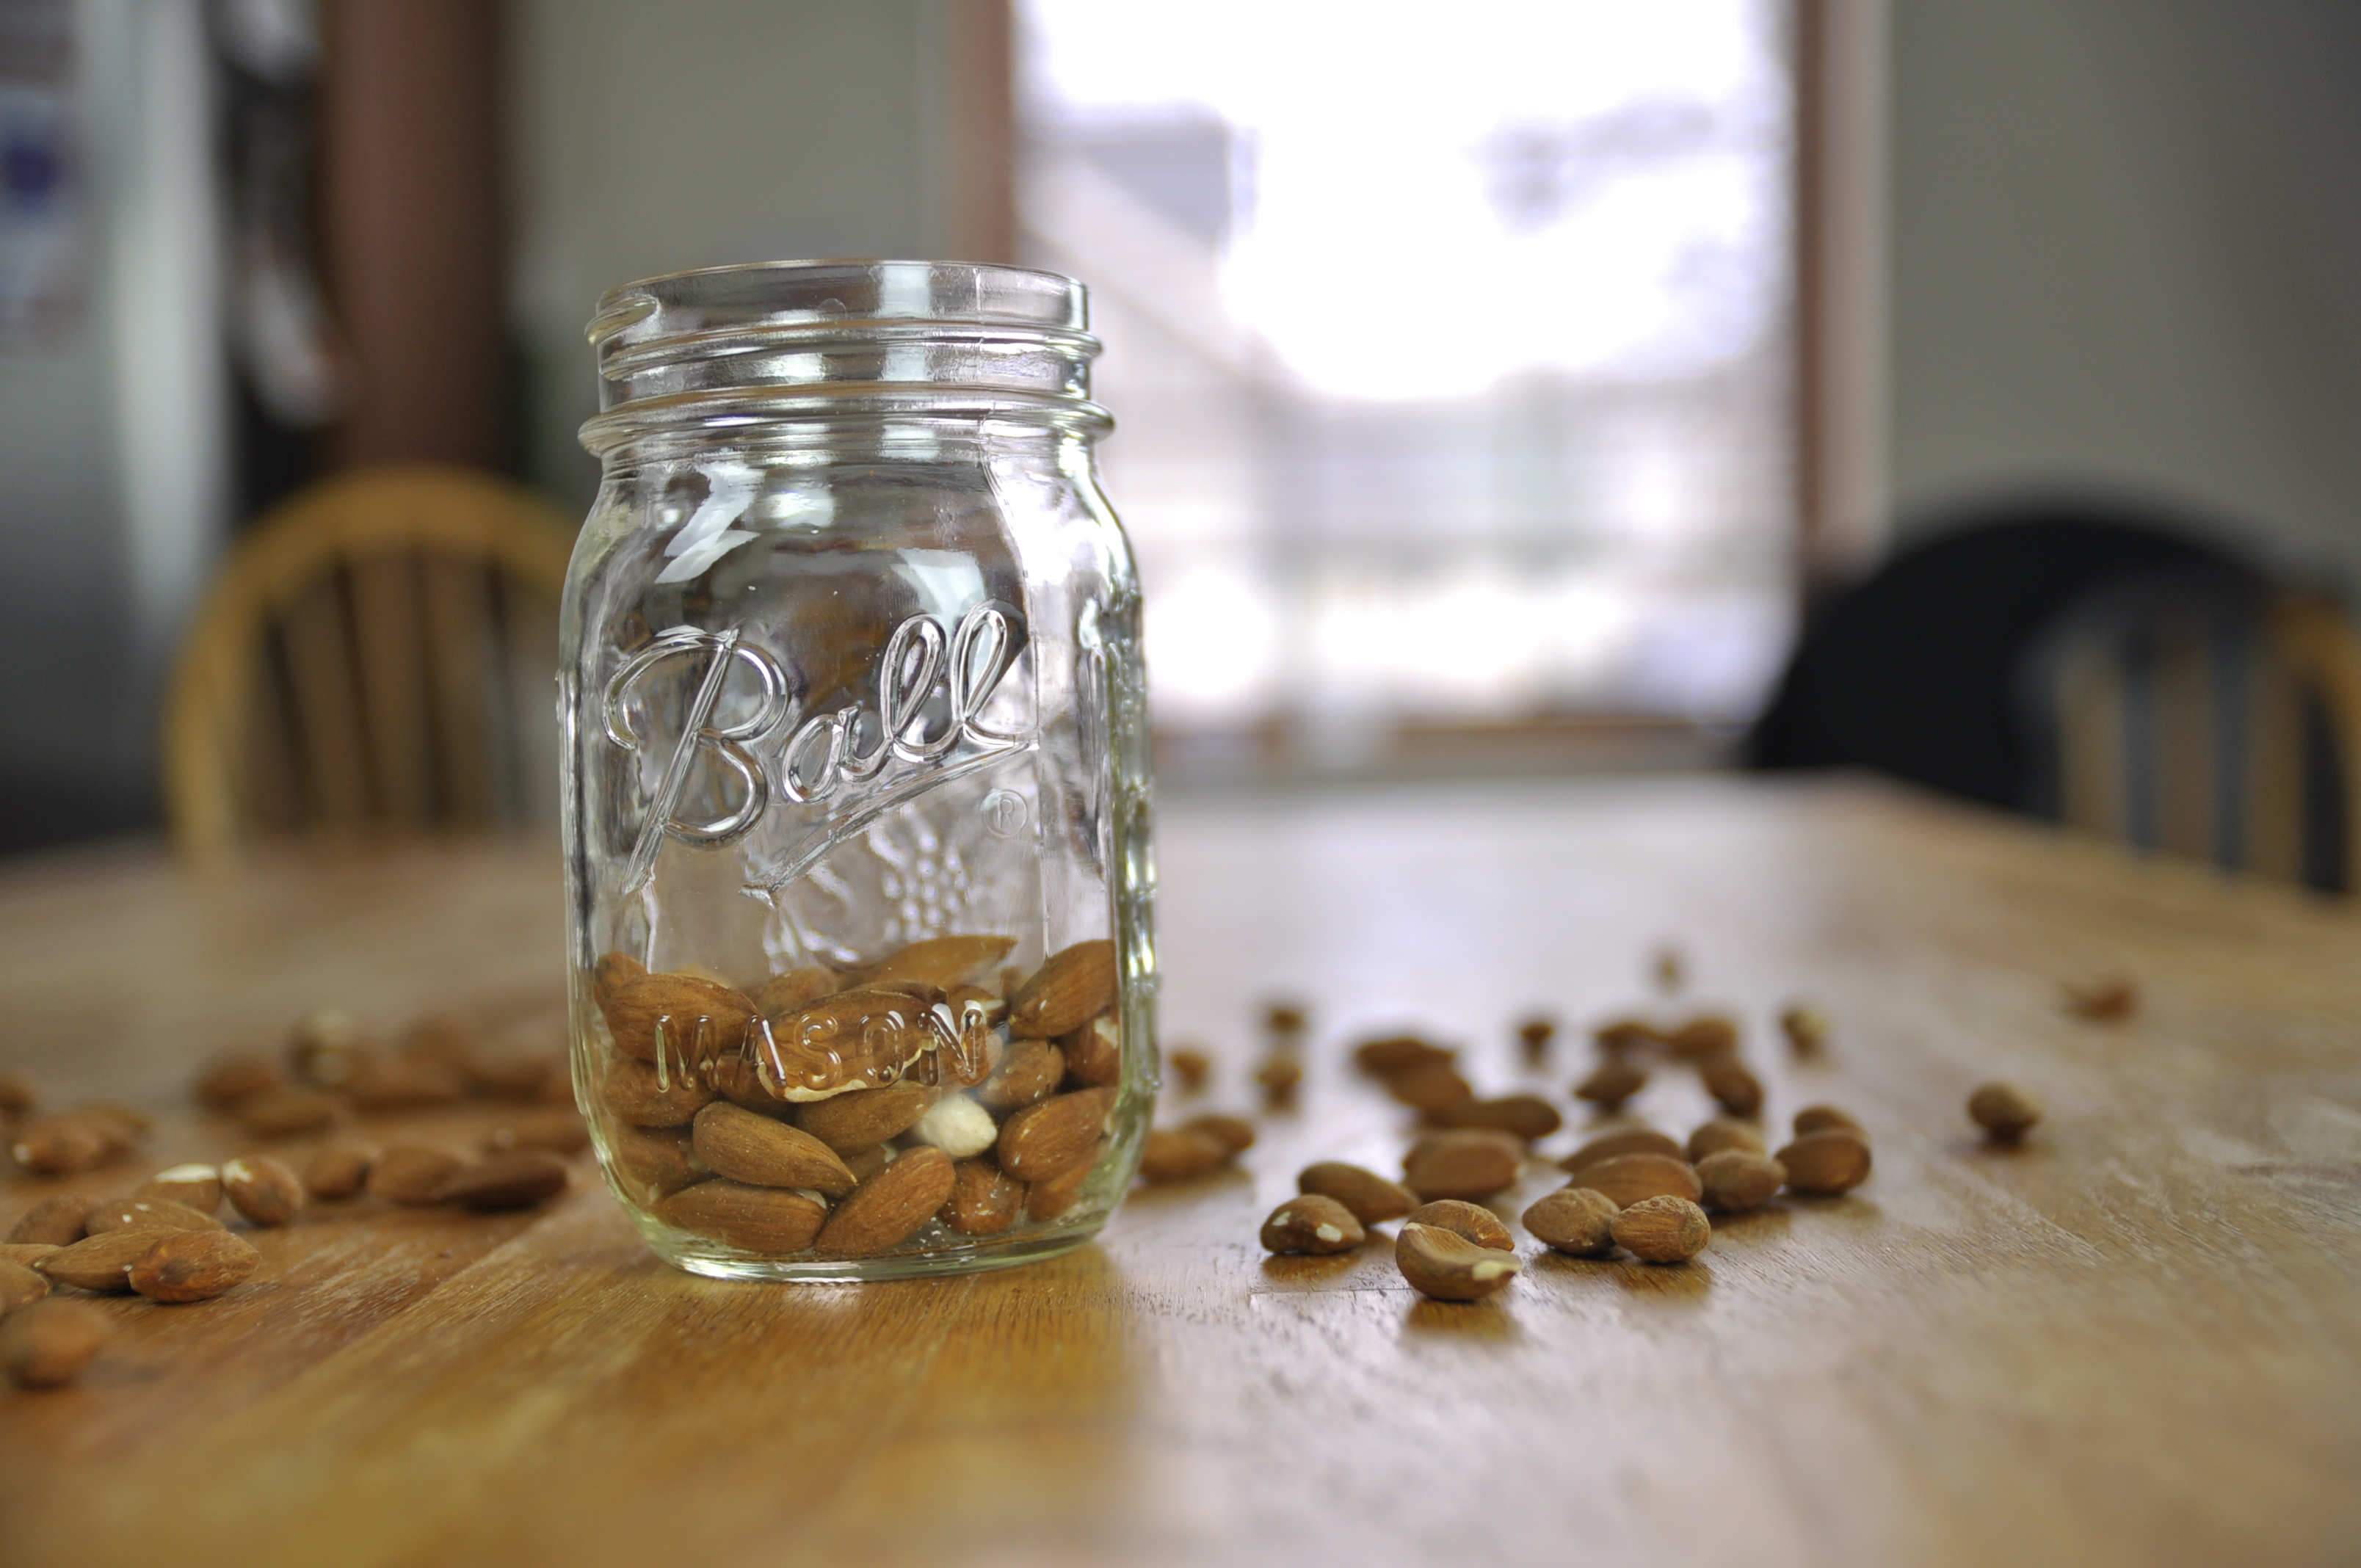 How To Make Vegan Chocolate Almond Milk